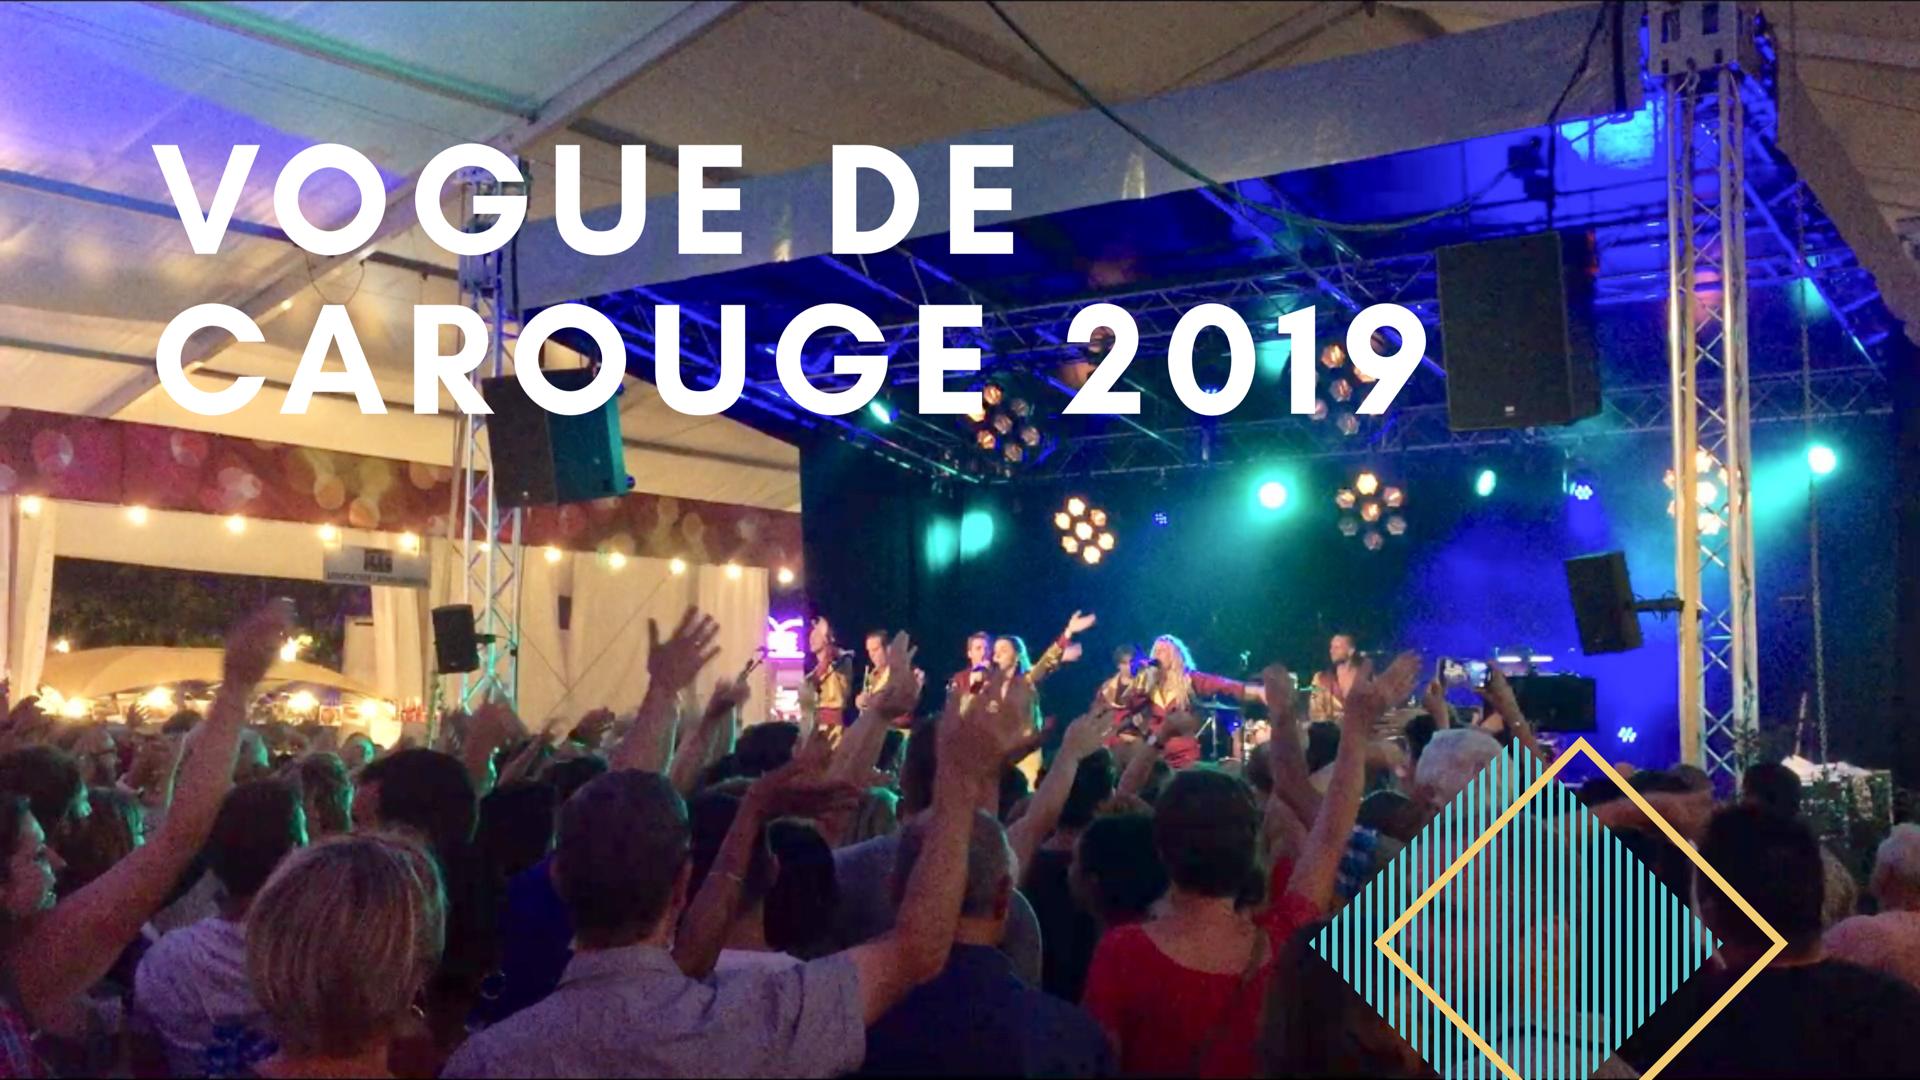 Vogue de Carouge 2019